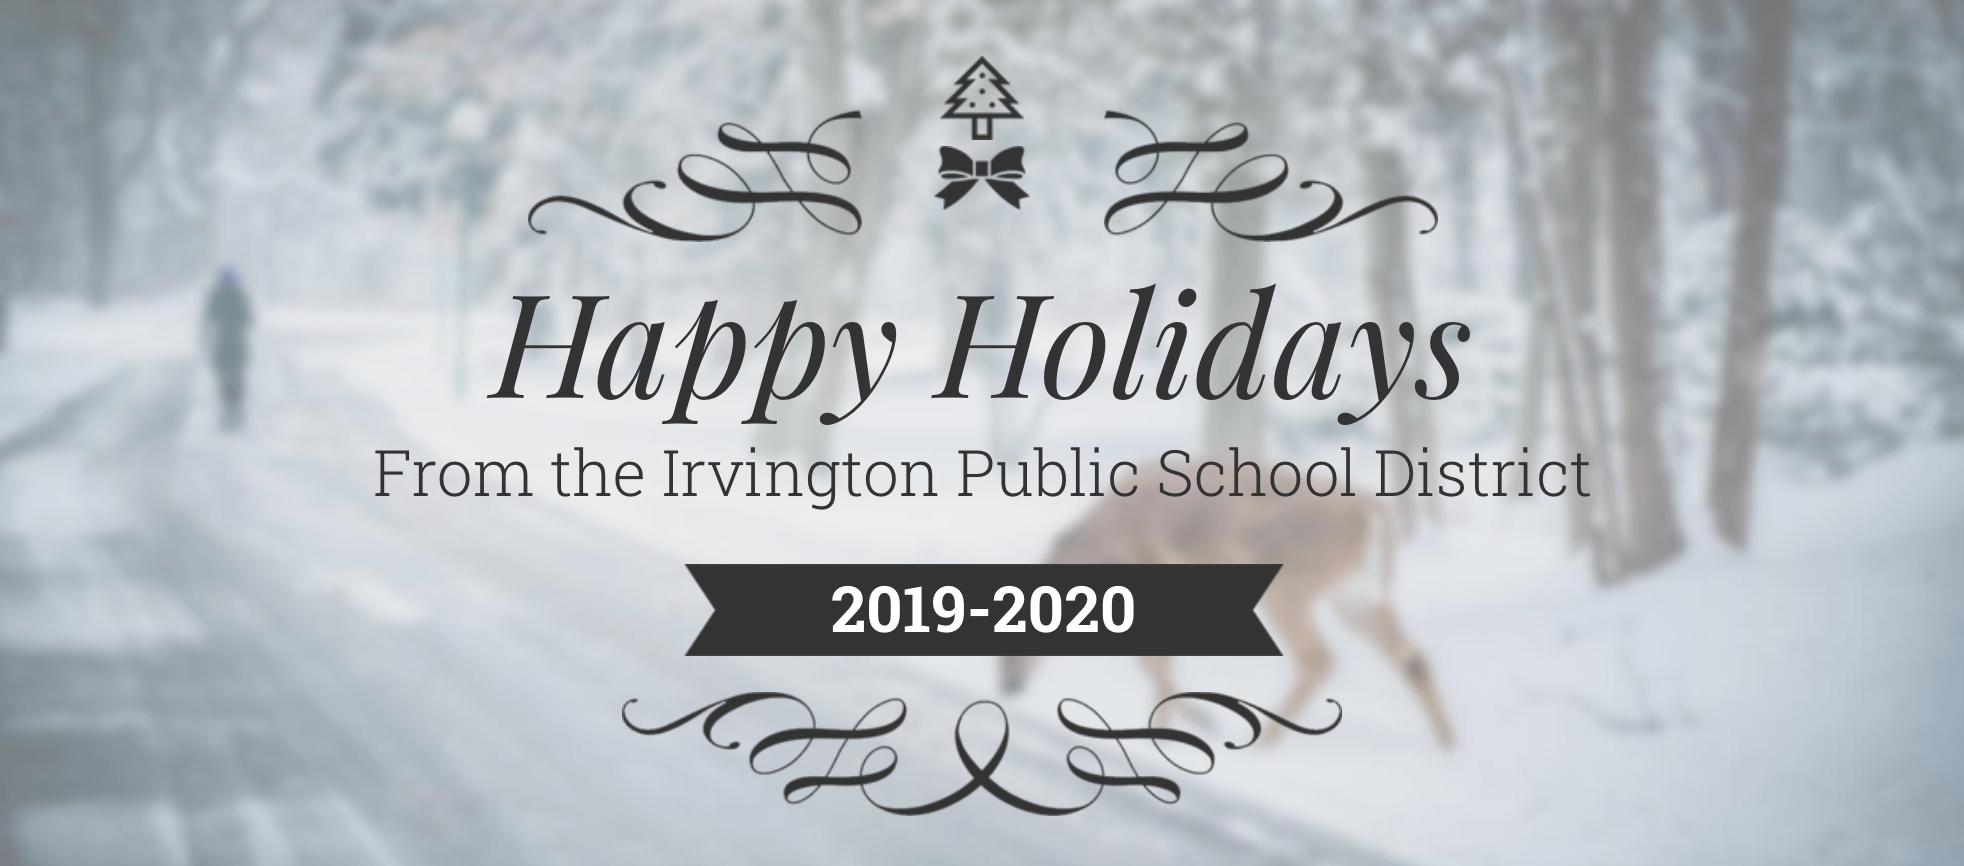 Happy Holidays from Irvington Public Schools 2019-2020